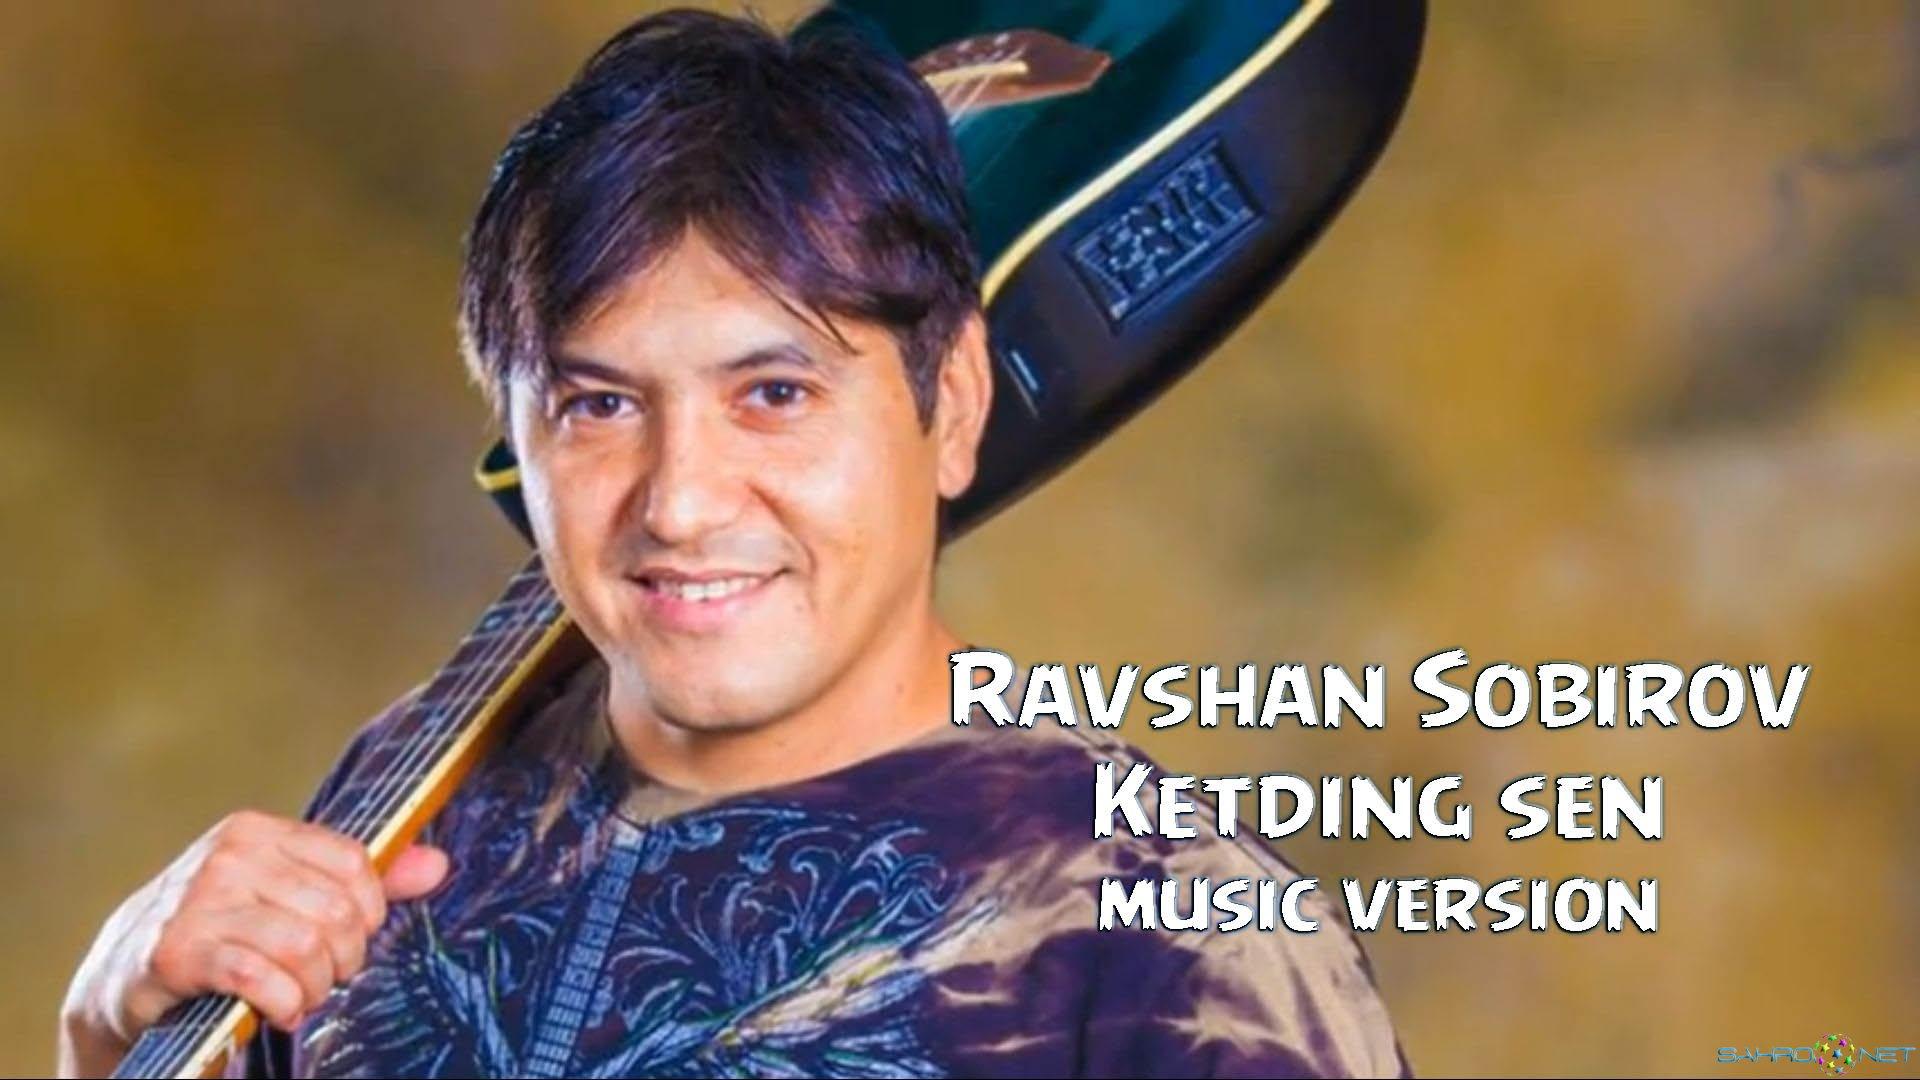 Ravshan Sobirov 2015 - Ketding sen (new music) 2015